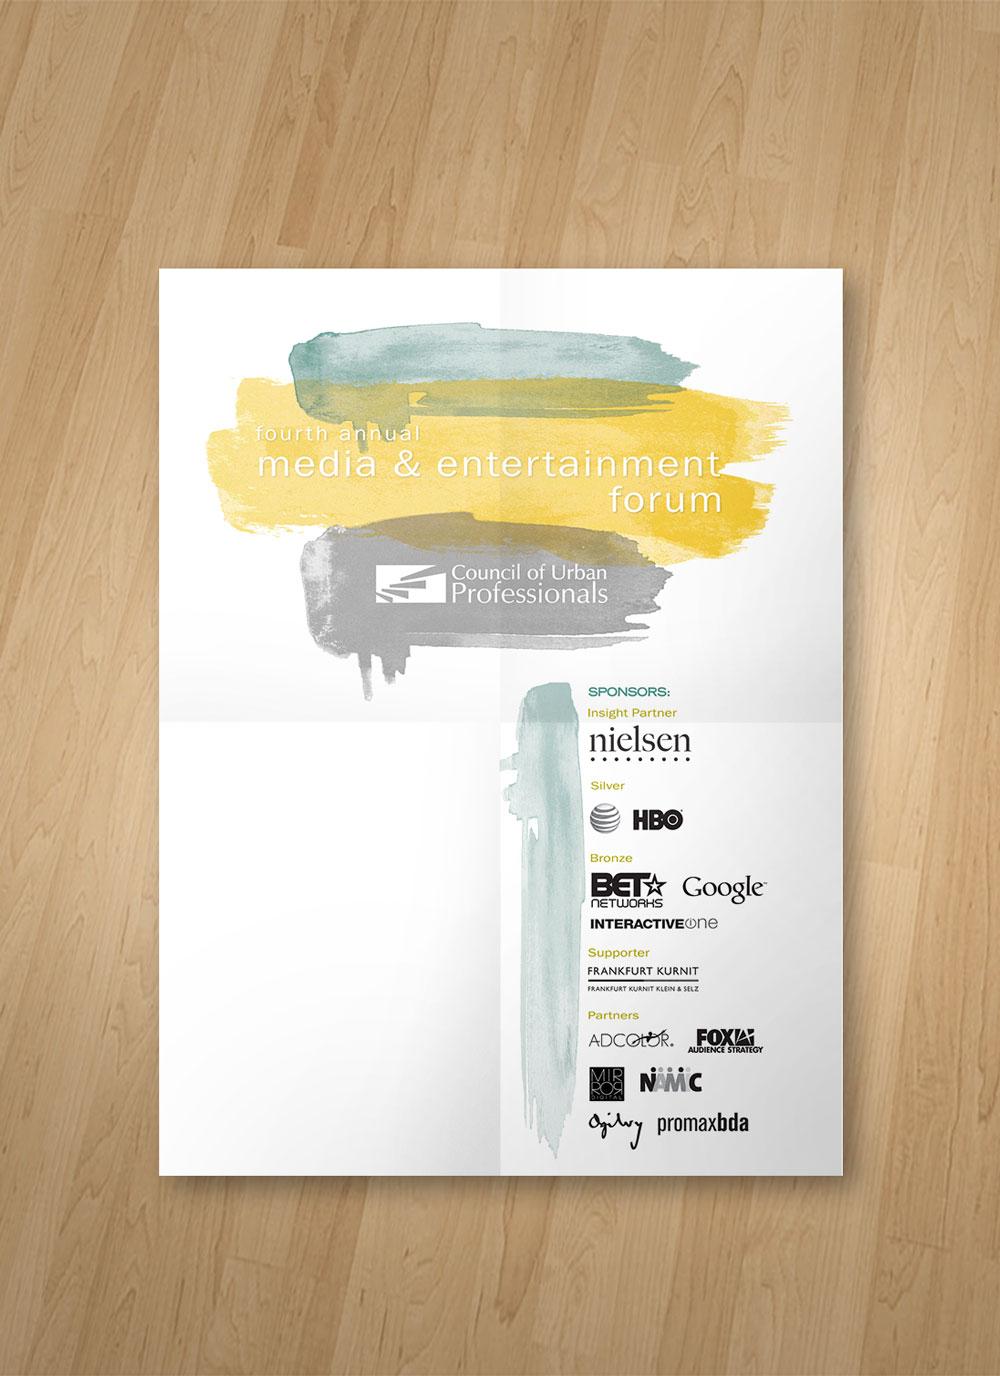 Media & Entertainment Forum - Poster